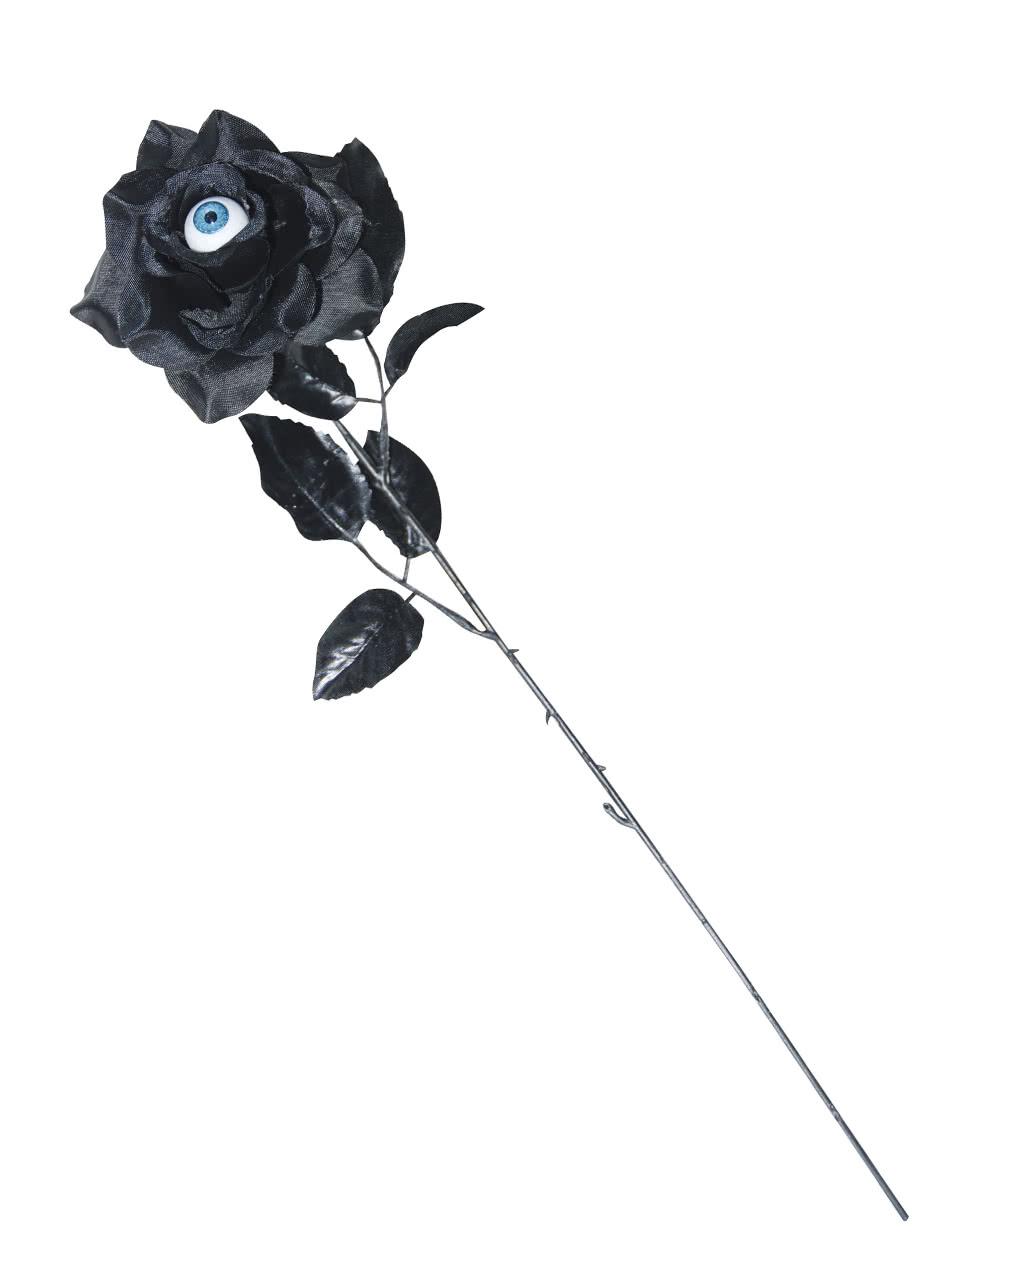 schwarze rose mit auge halloween deko blume horror. Black Bedroom Furniture Sets. Home Design Ideas